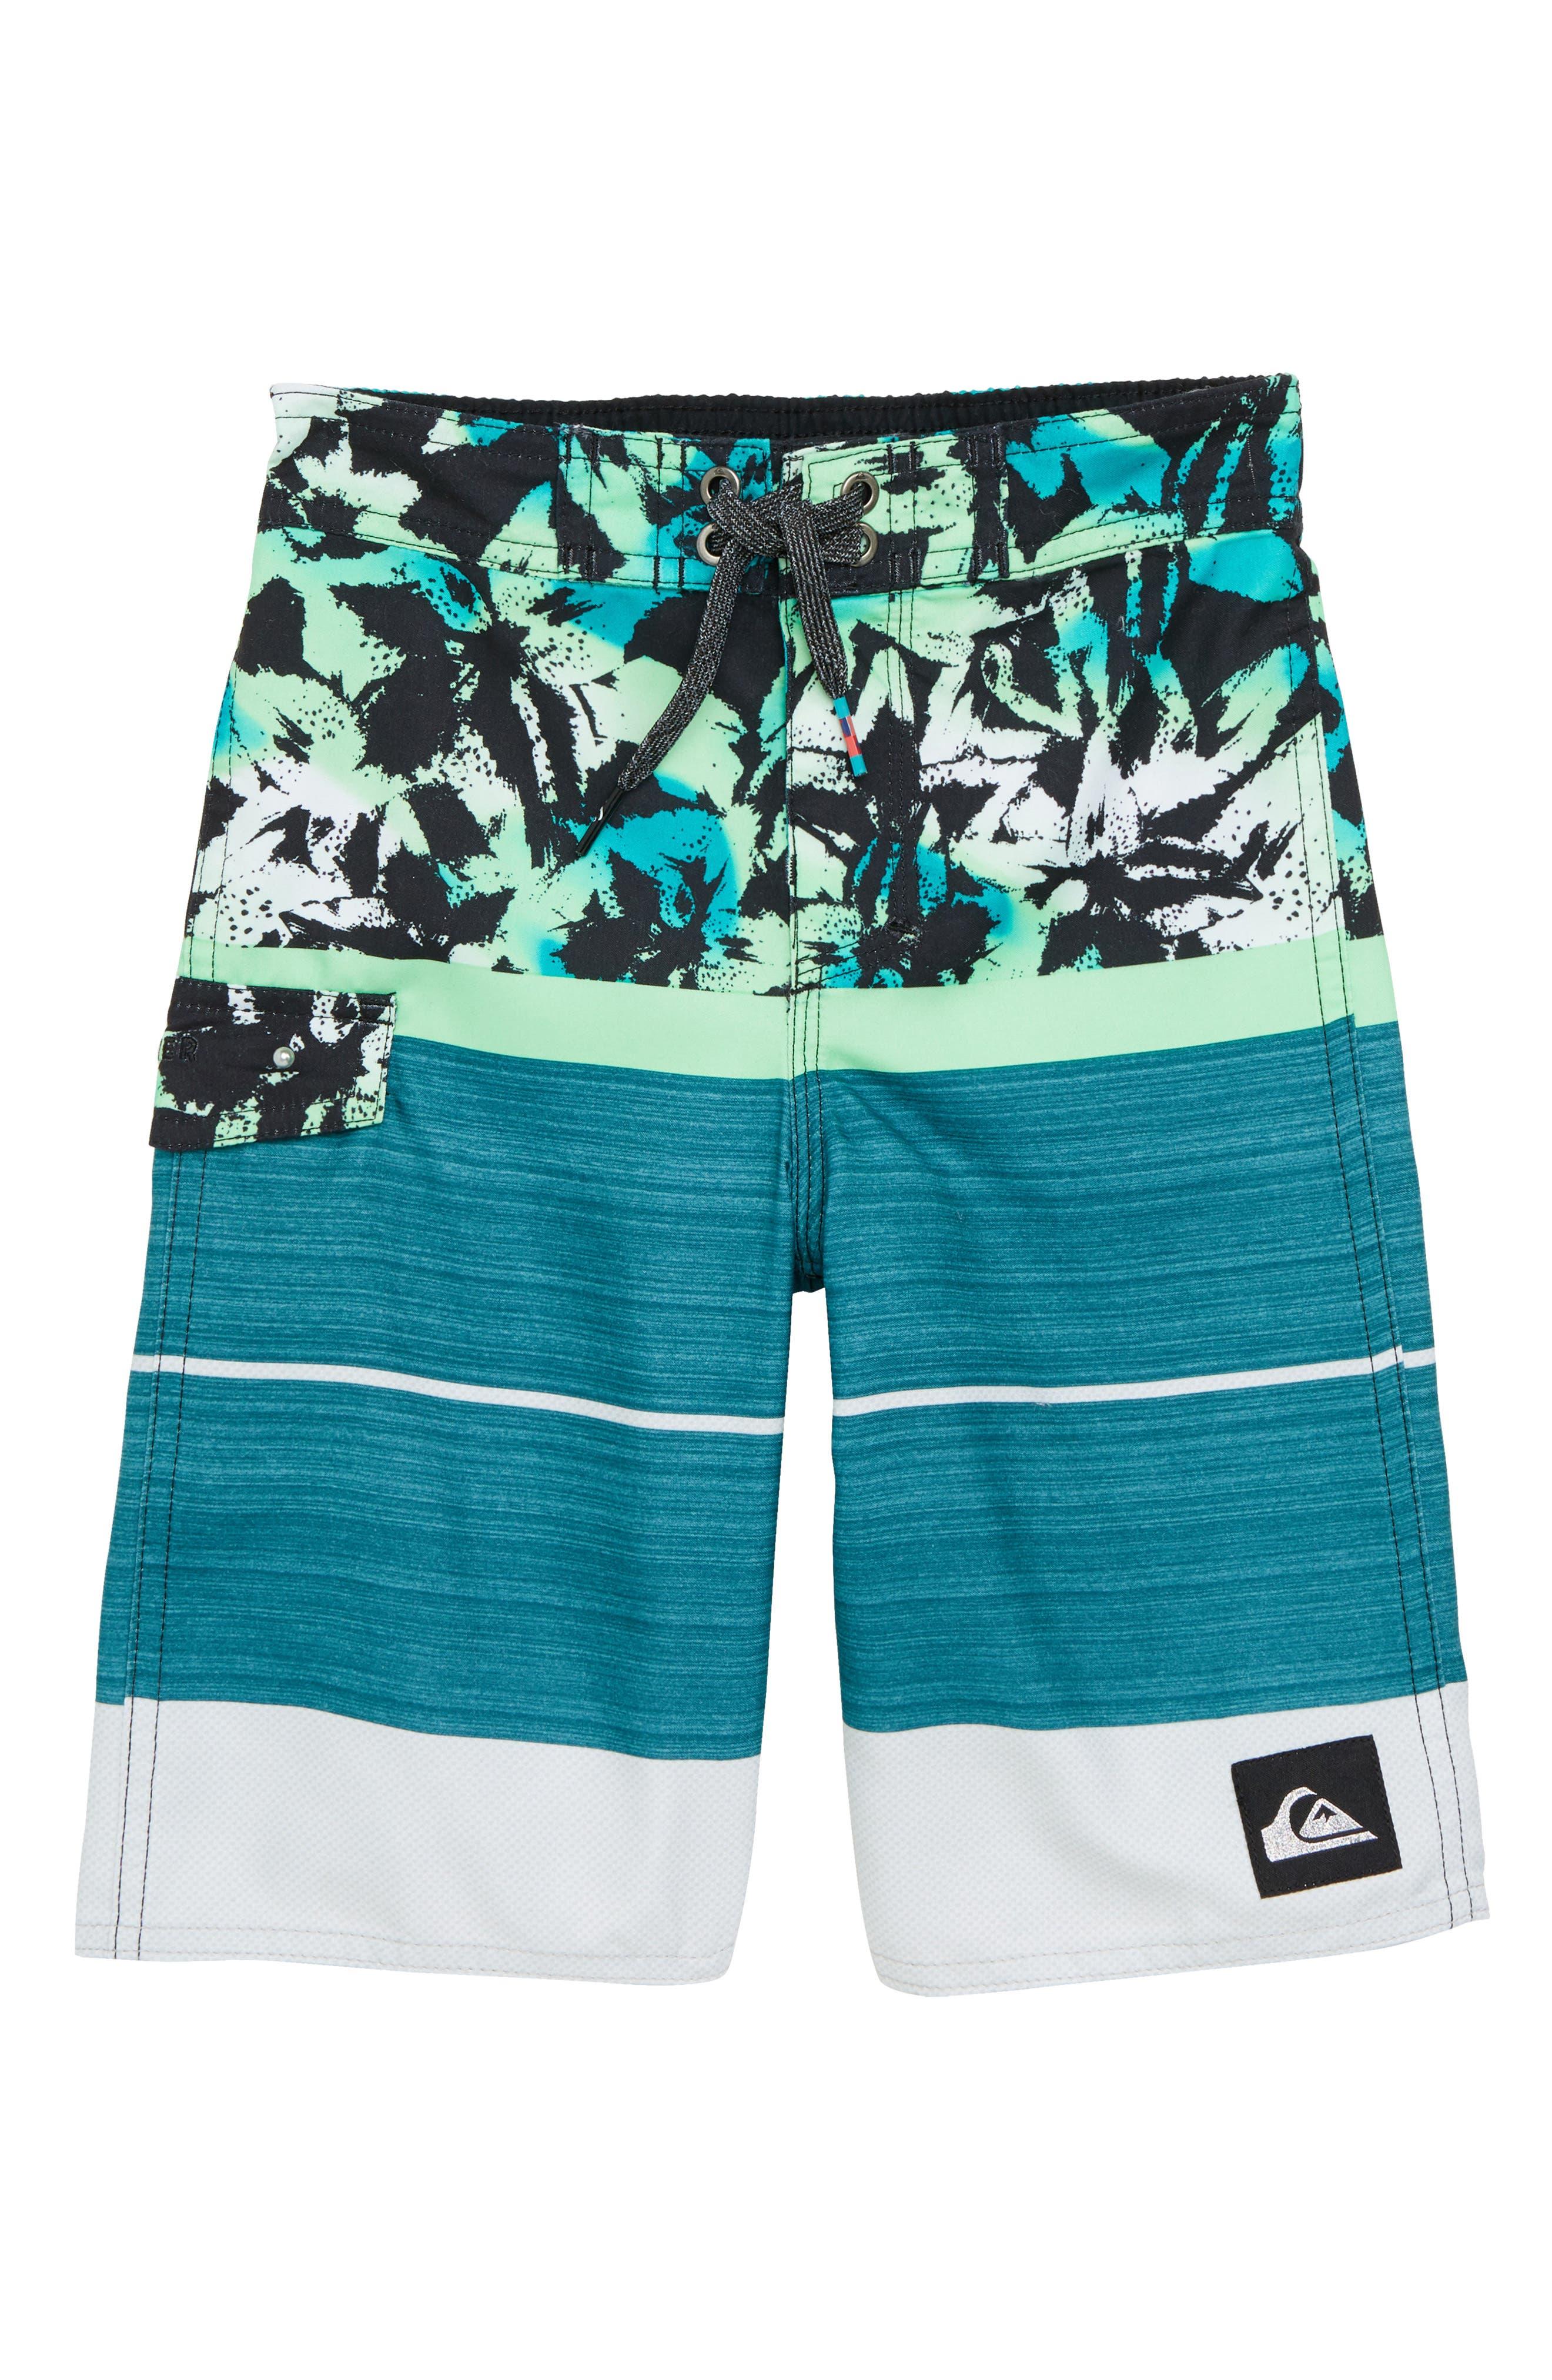 Slab Island Board Shorts,                             Main thumbnail 1, color,                             Atlantic Deep